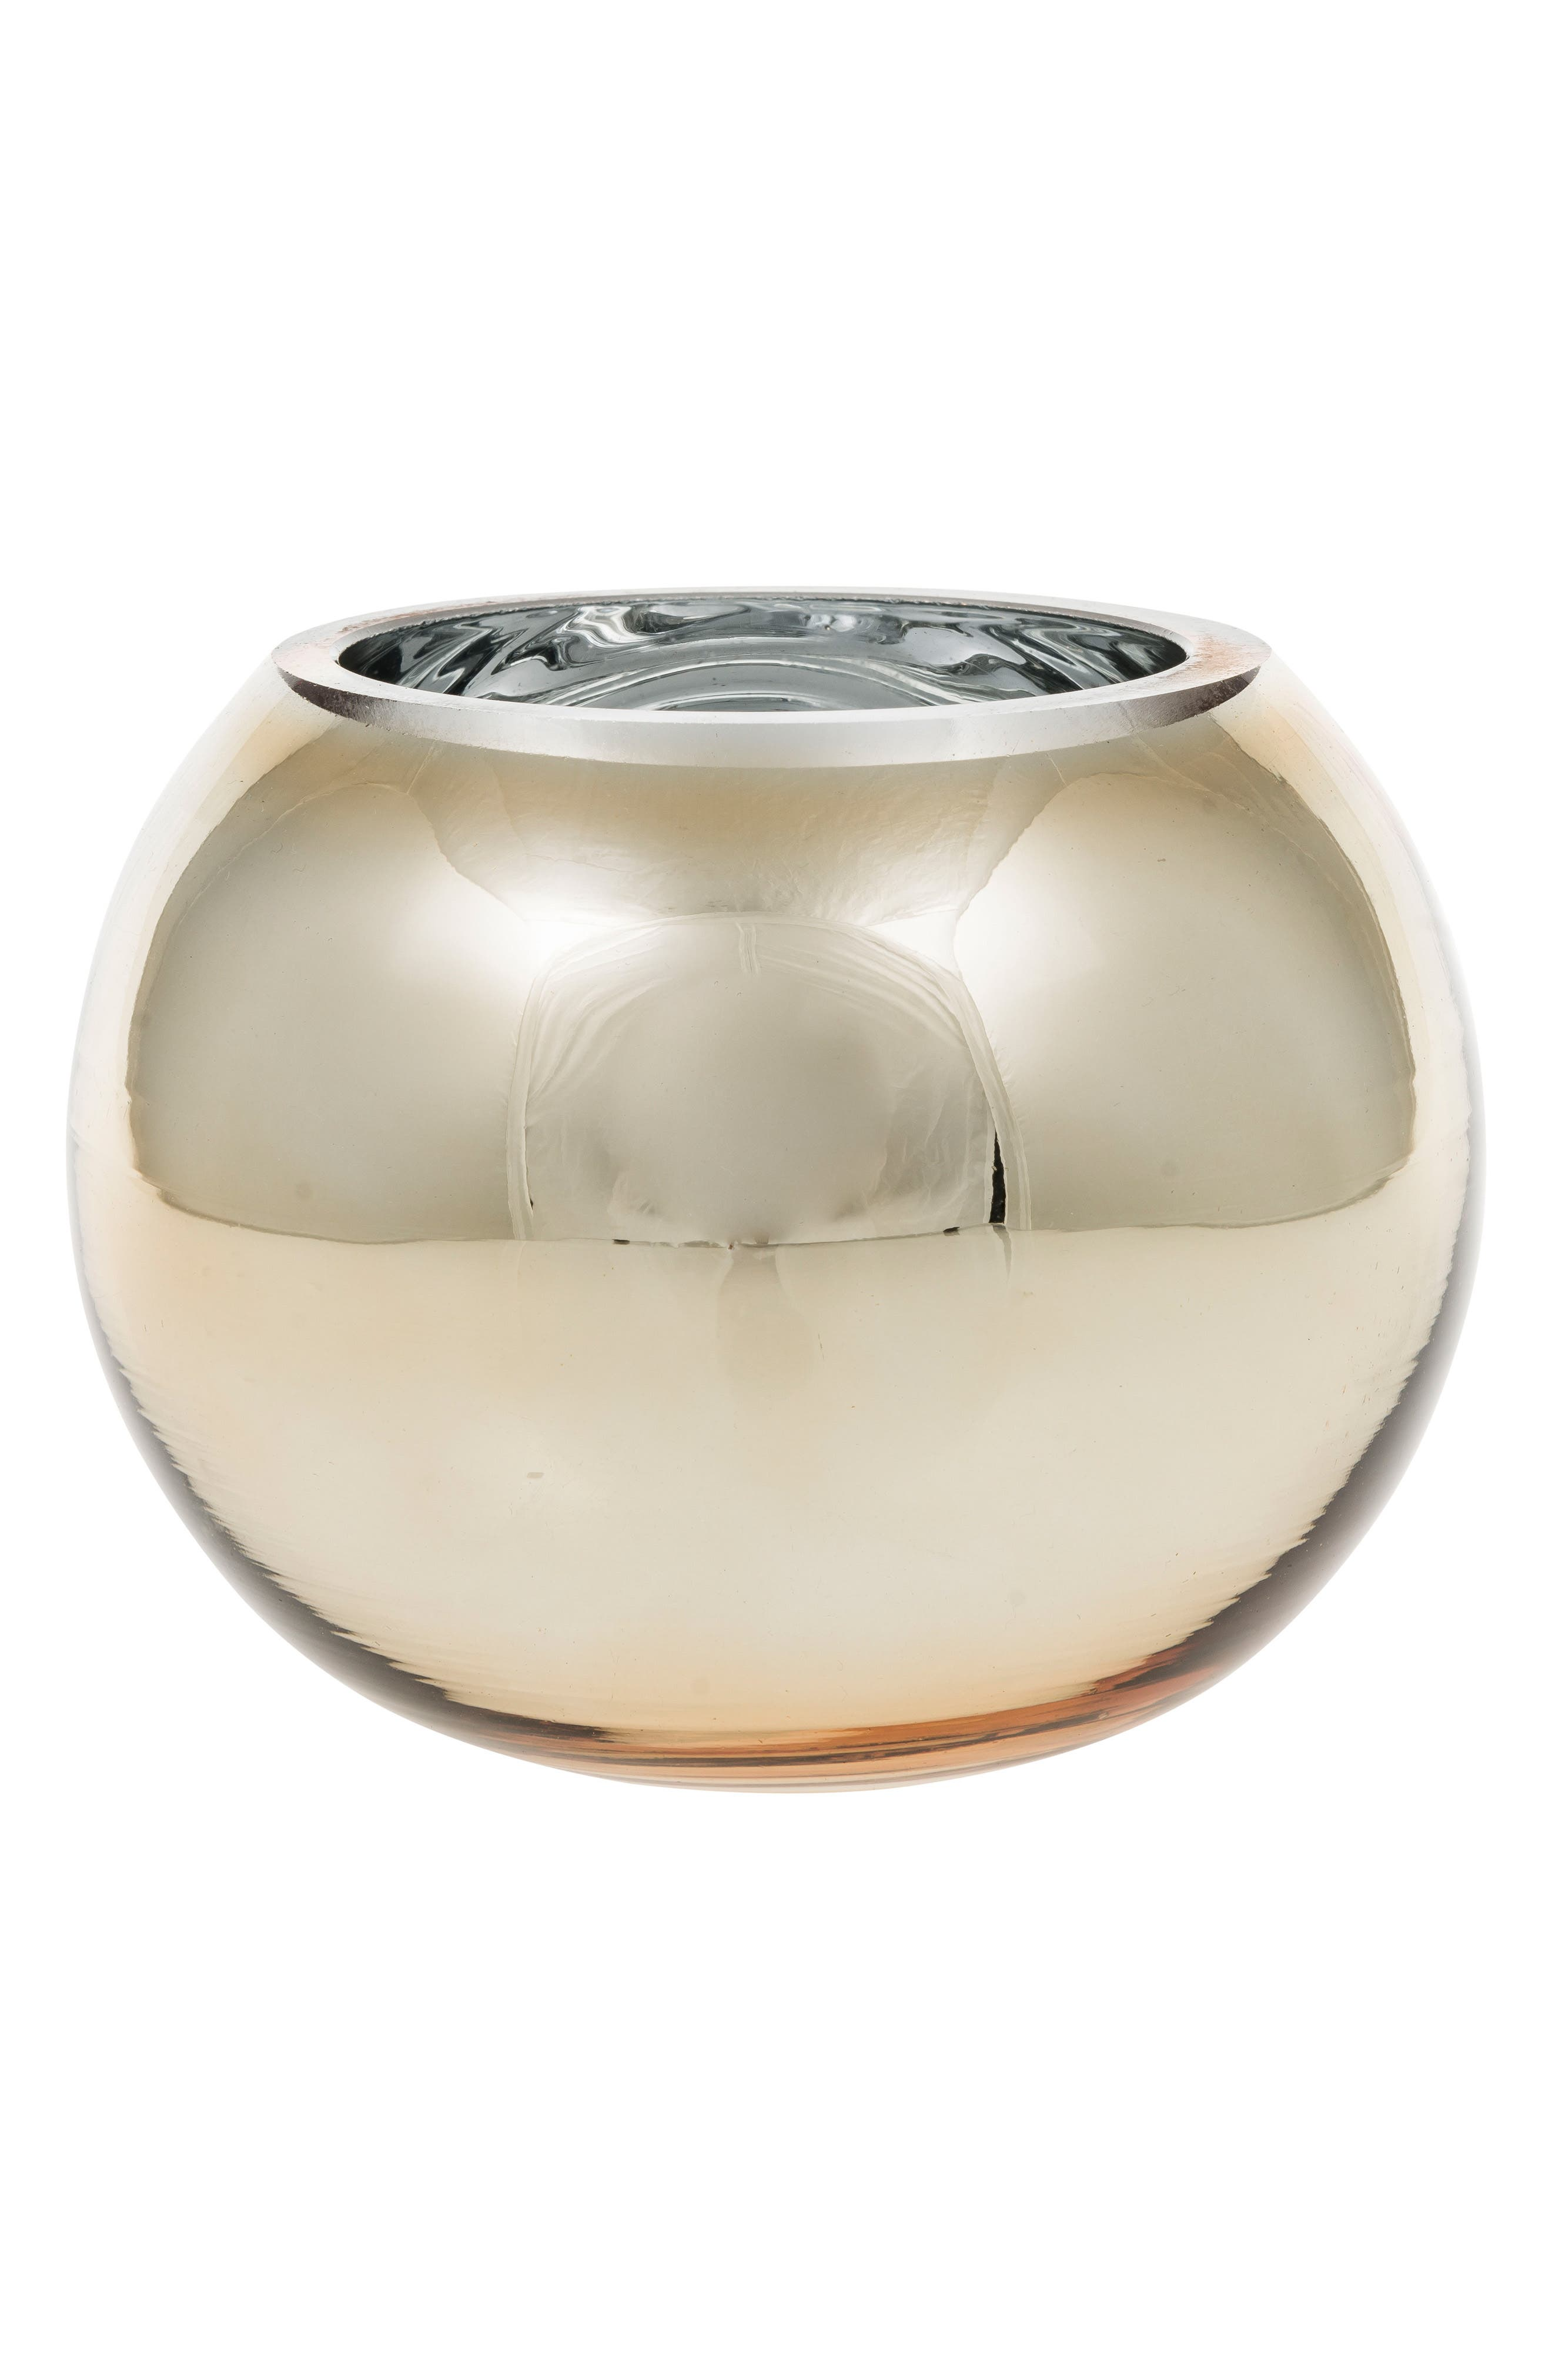 Nemo Vase,                         Main,                         color, Gold